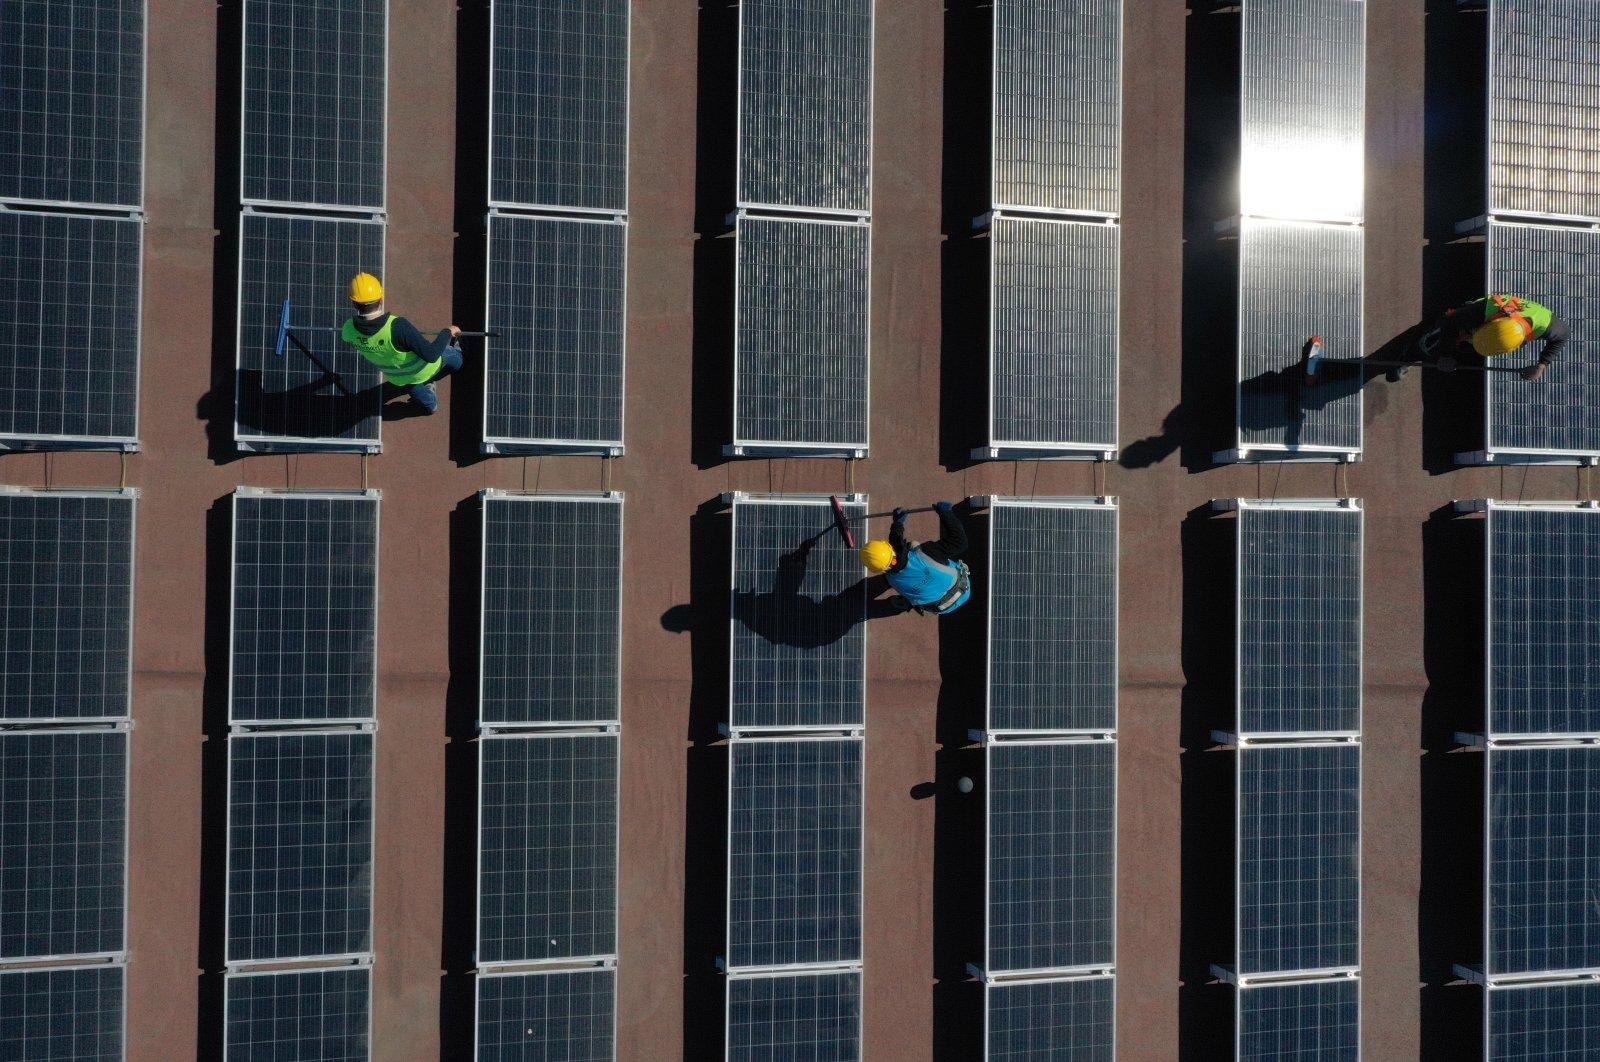 Employees work on installingsolar panels in a complex belonging to Bursa Municipality, Bursa, northwestern Turkey, March 3, 2021. (AA Photo)